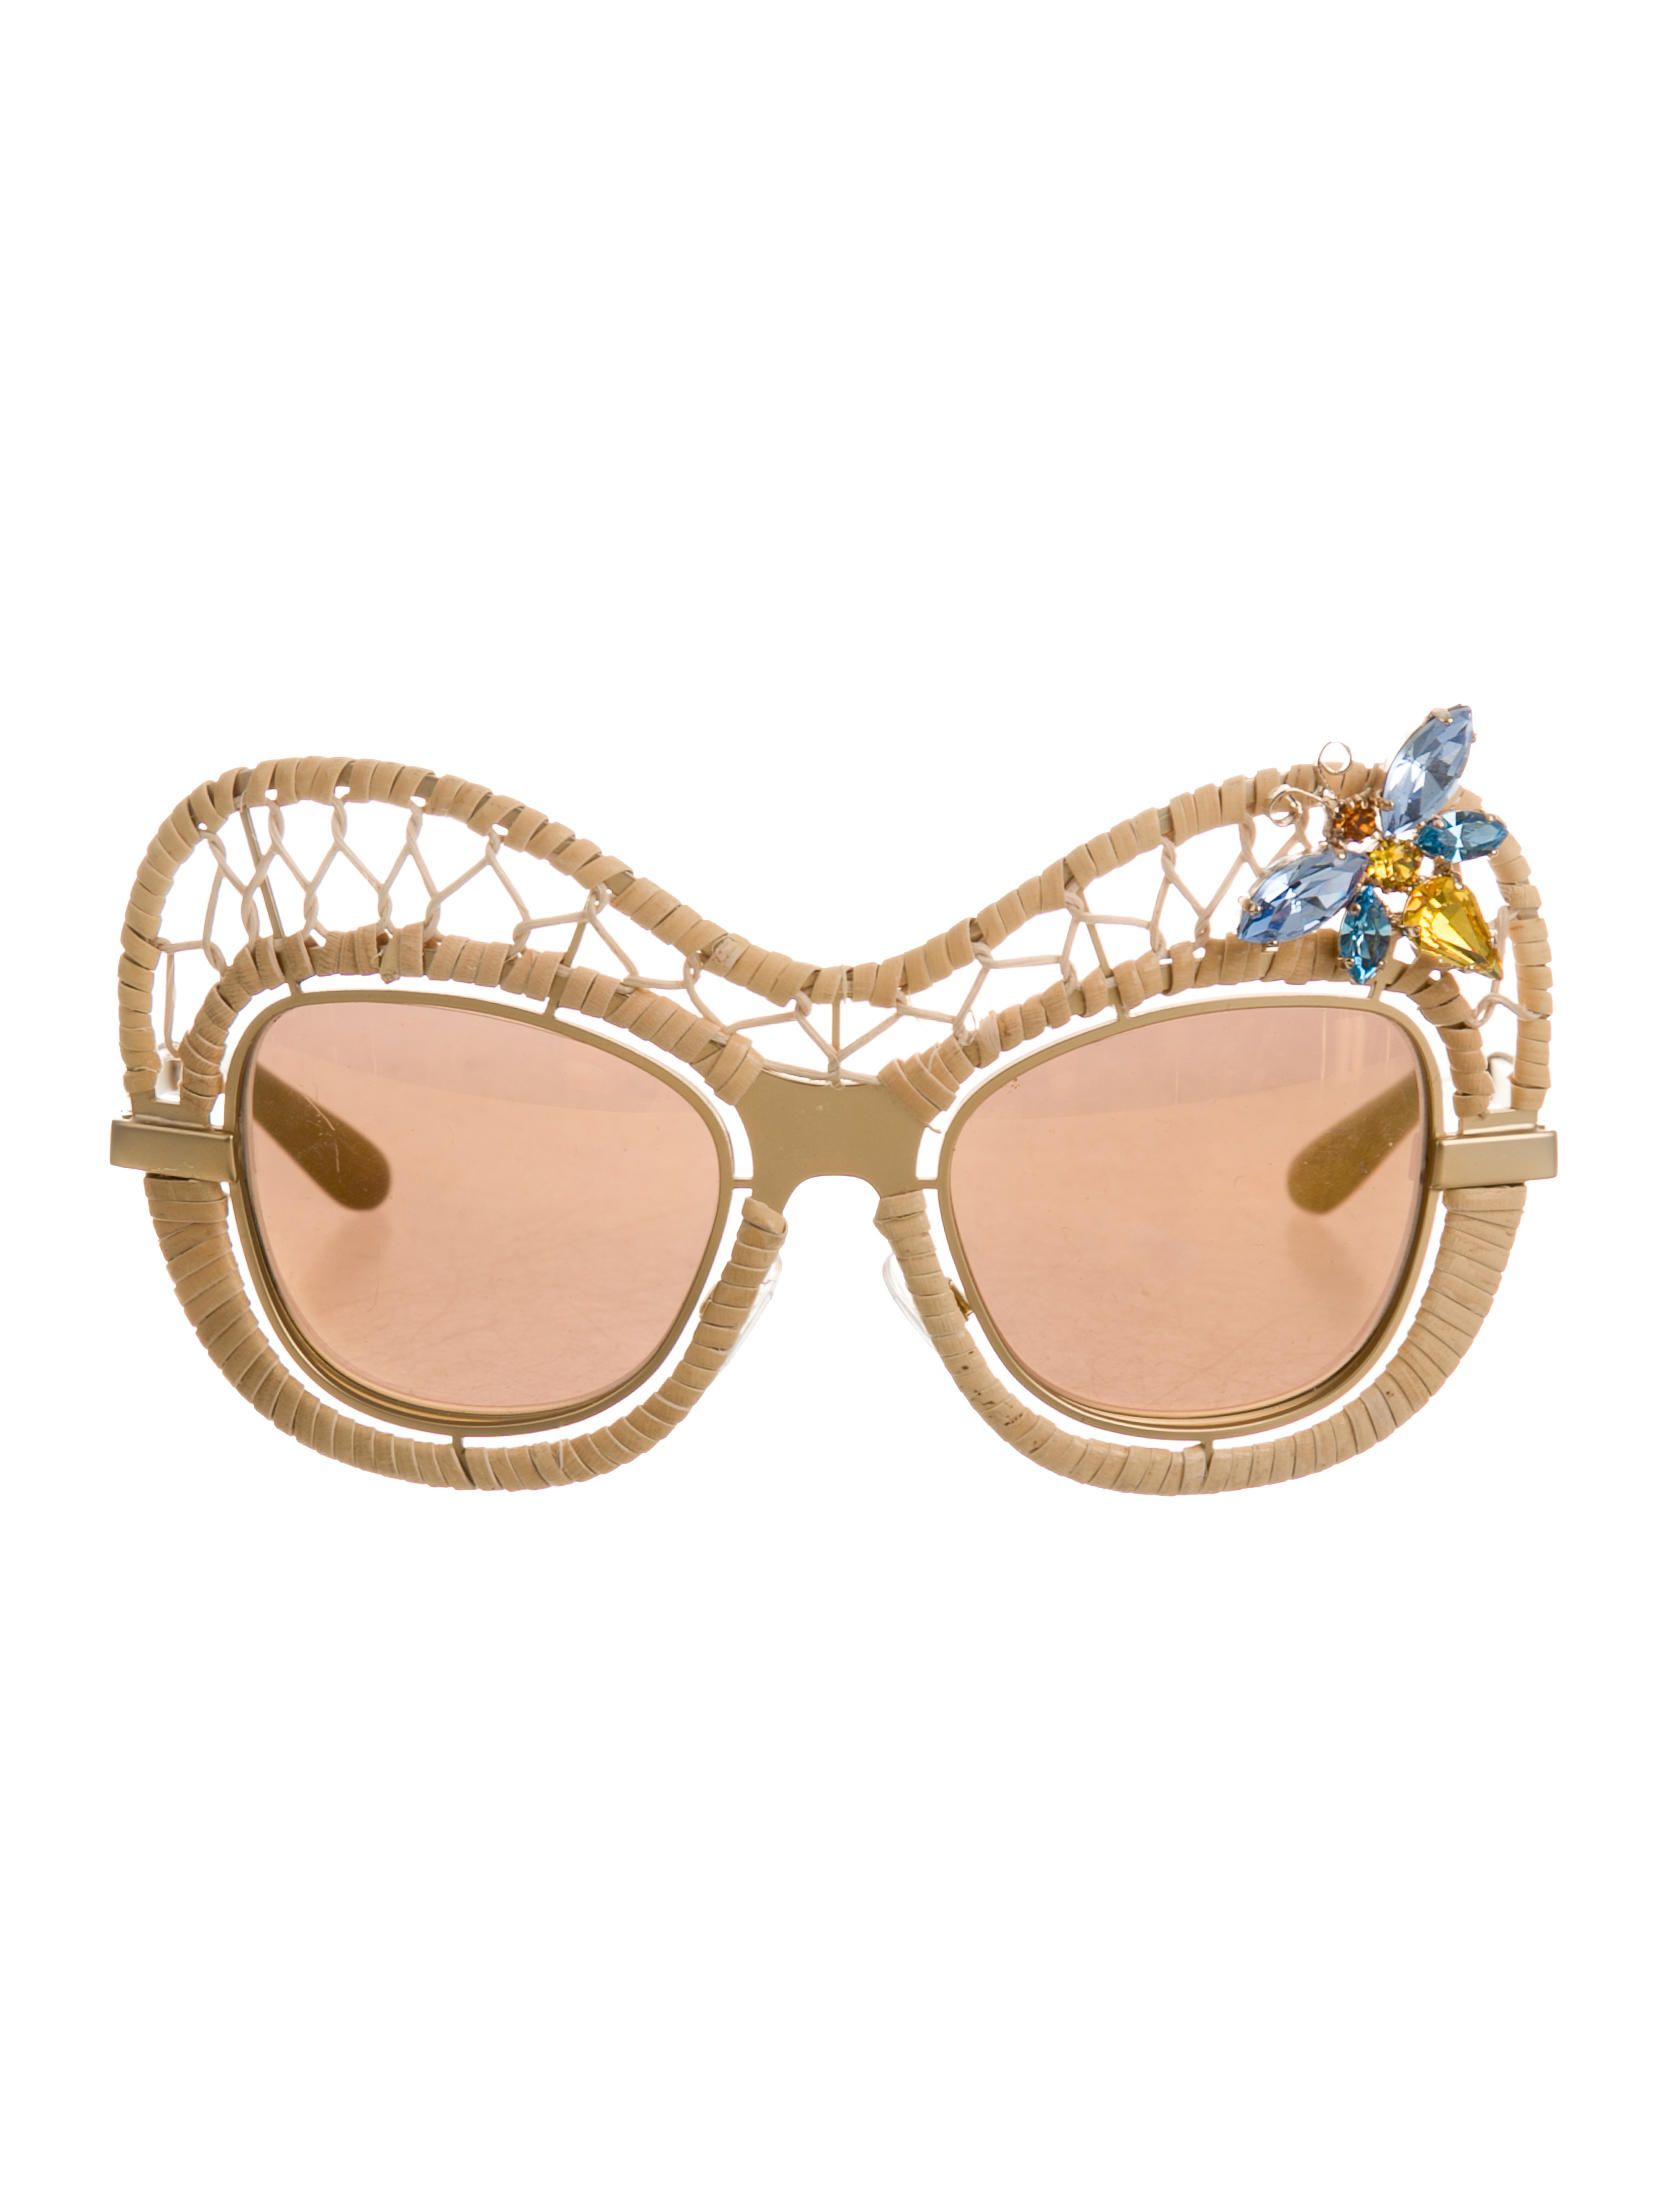 SunglassesLe Garden SunglassesDolce 2016 Regard Botanical L45ARj